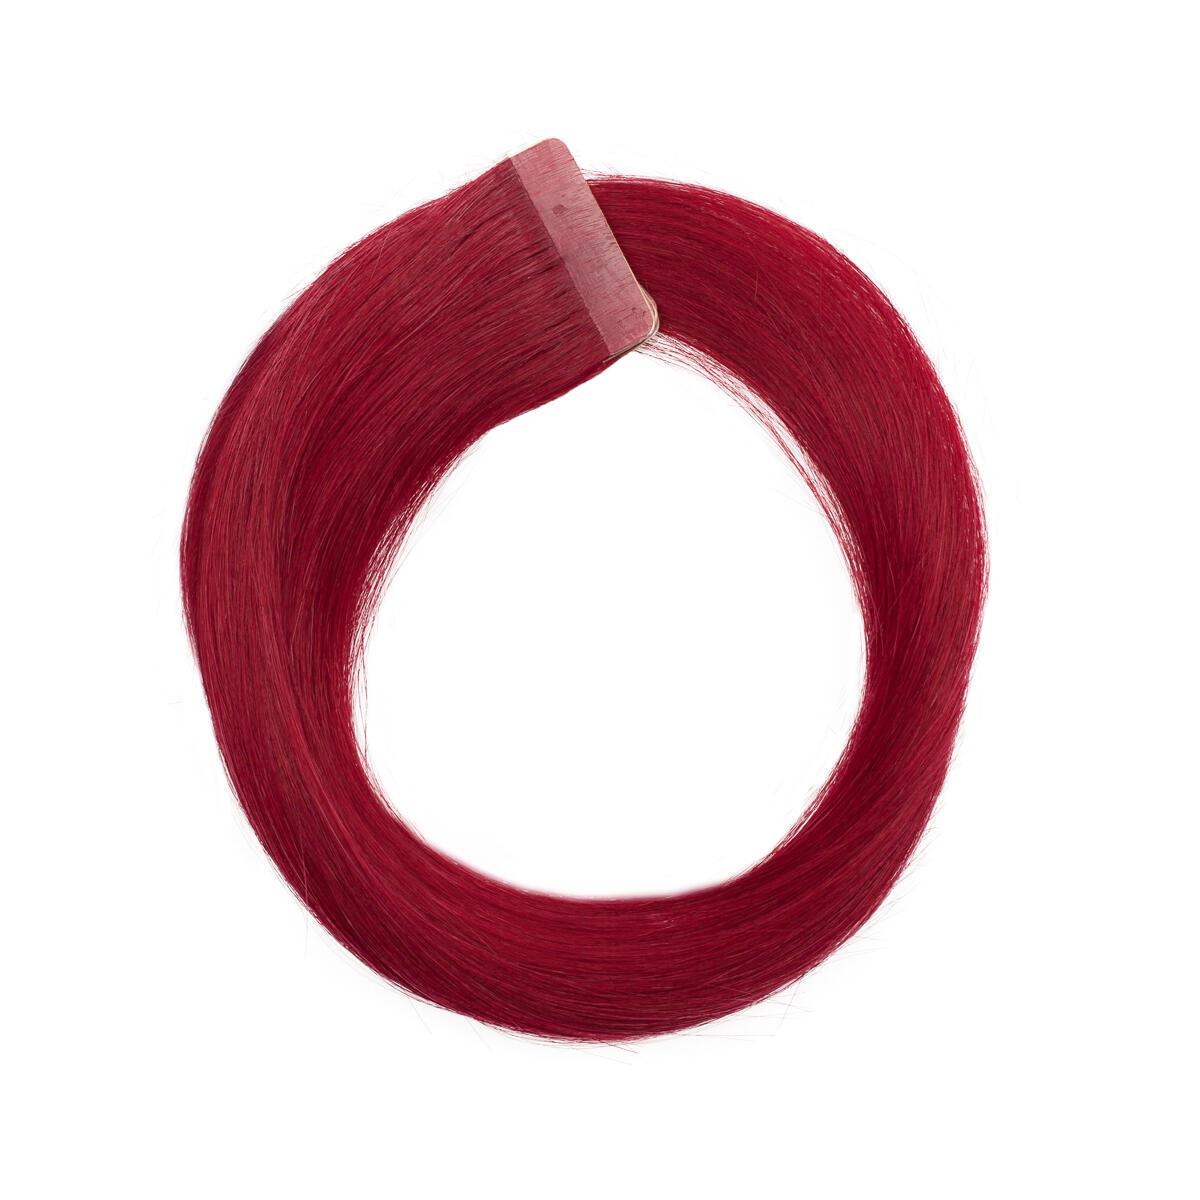 Quick & Easy 6.9 Rubin Red 30 cm